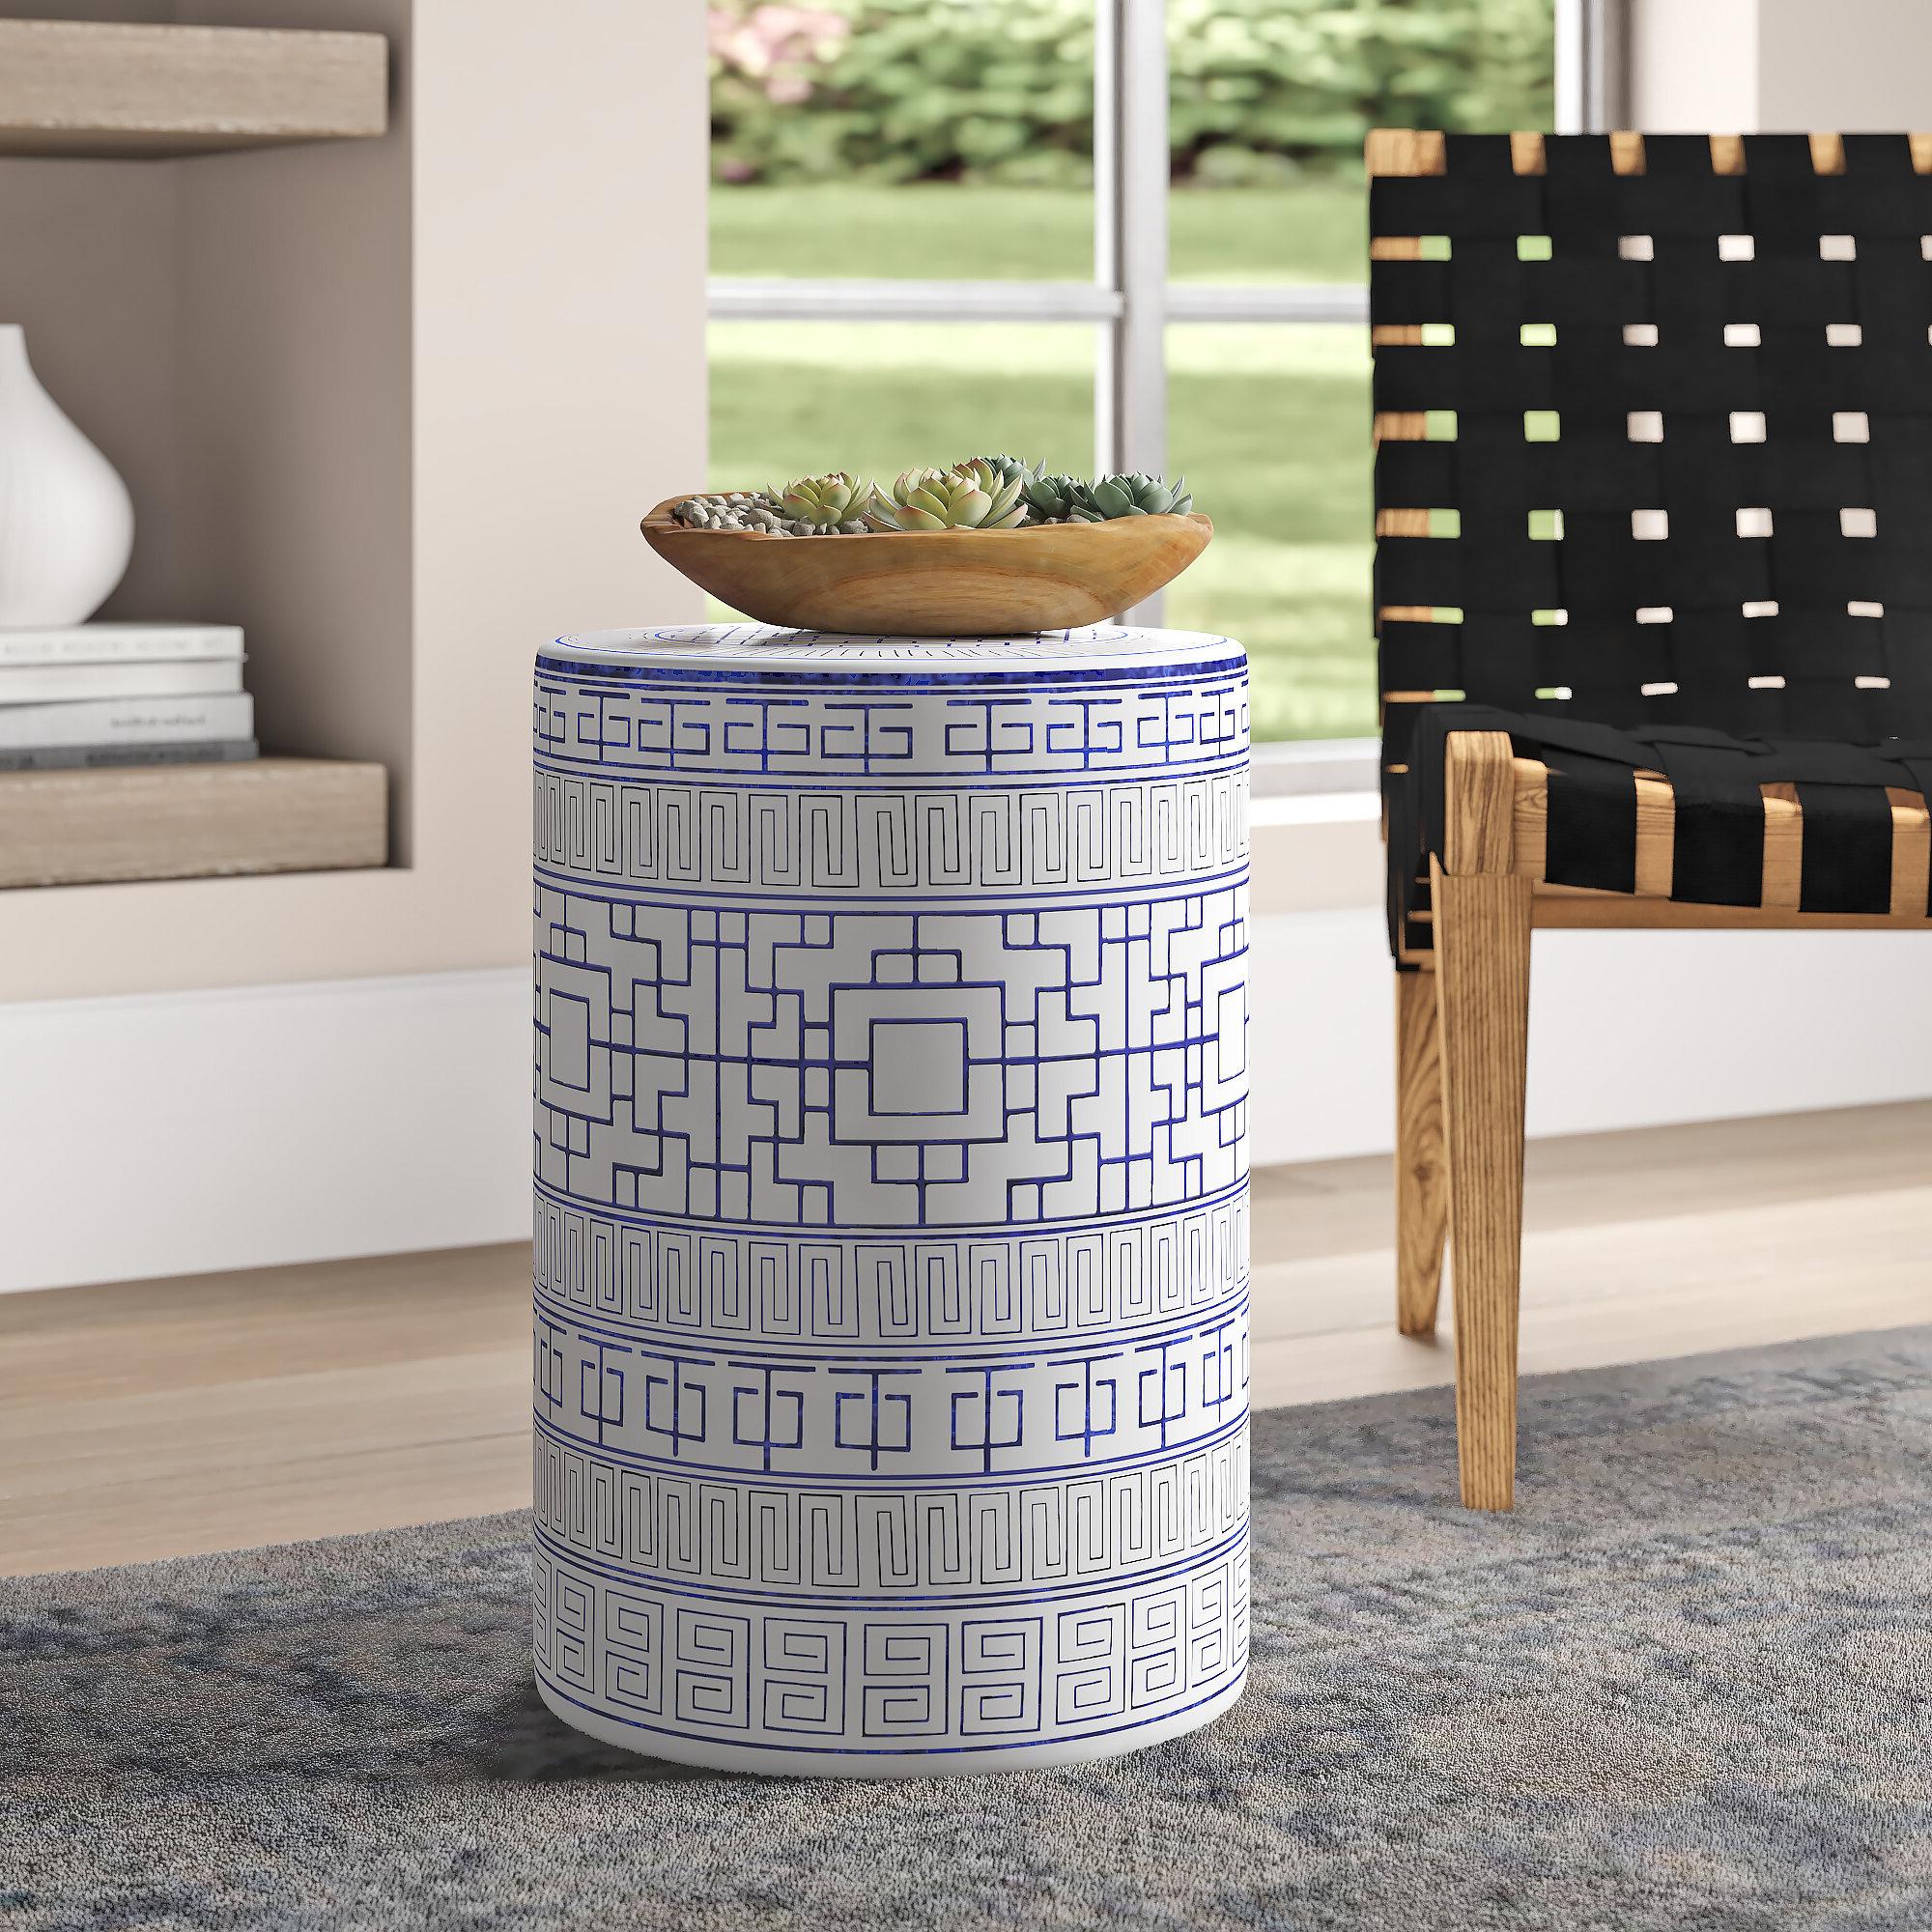 Keswick Ceramic Garden Stools Throughout Fashionable Anakin Ceramic Garden Stool (View 6 of 30)